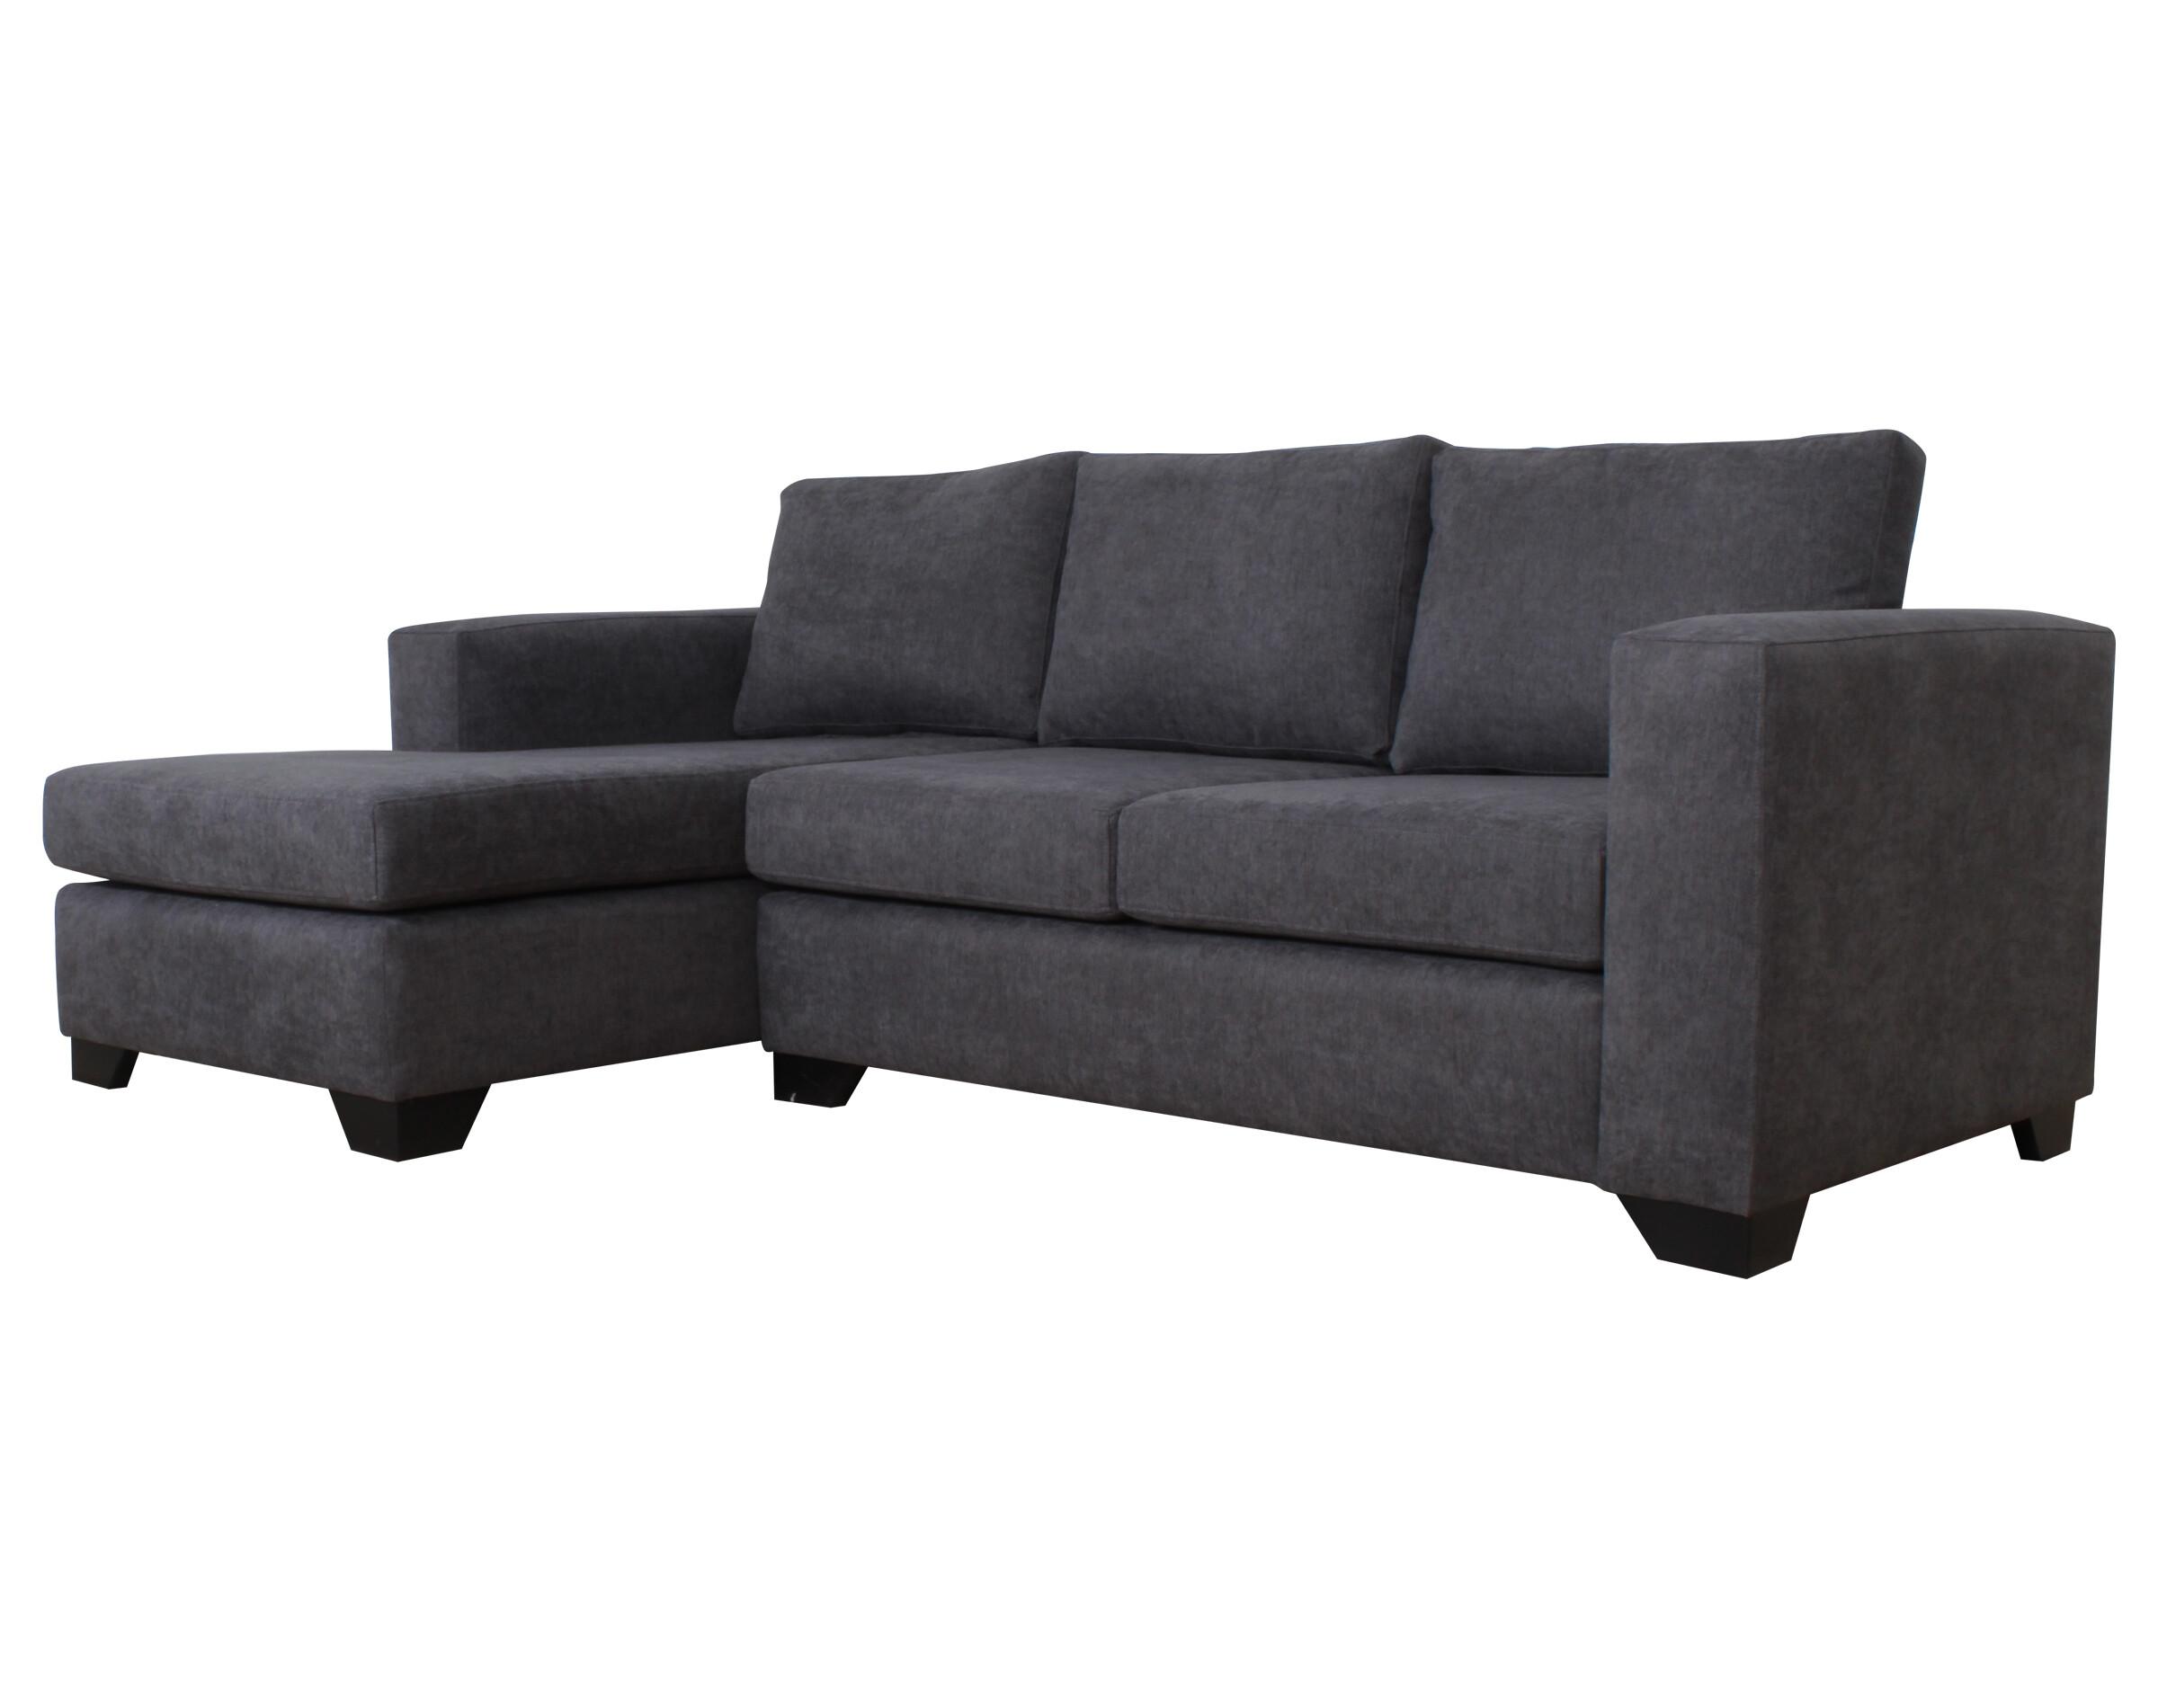 Sofa Seccional Monaco Izquierdo Mecha Gris